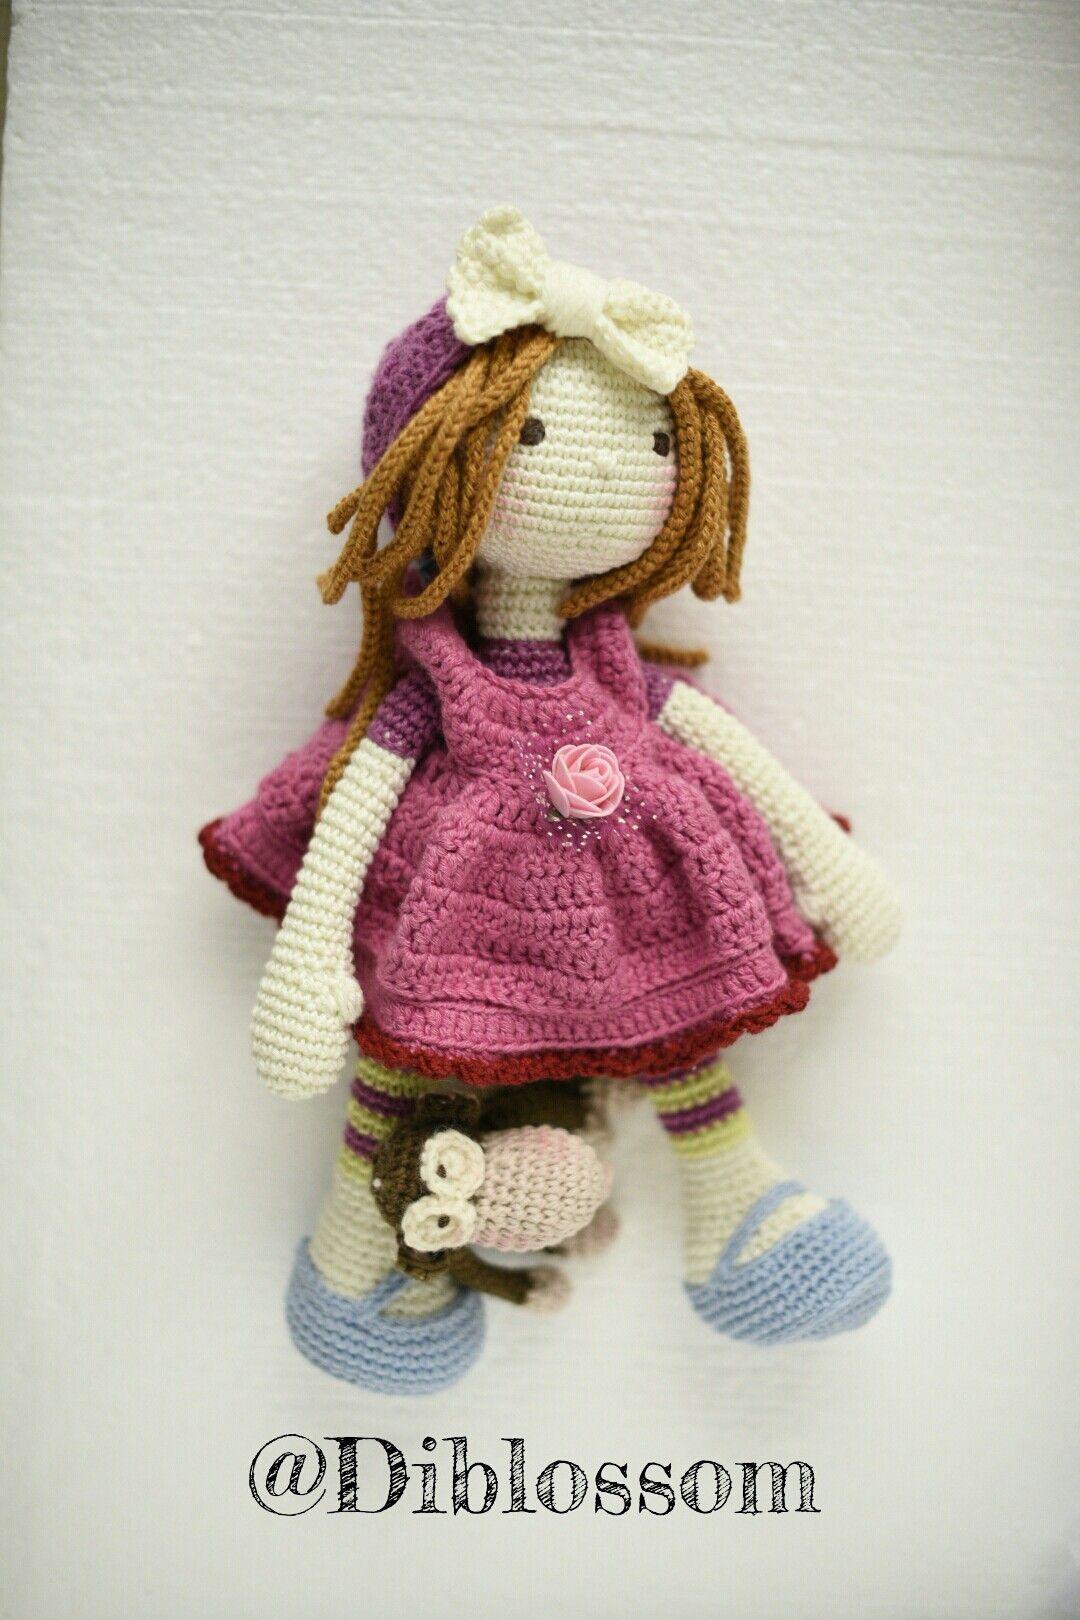 #amigurumi #crochet #dolls #handmade #crochetdoll #yarn # ...